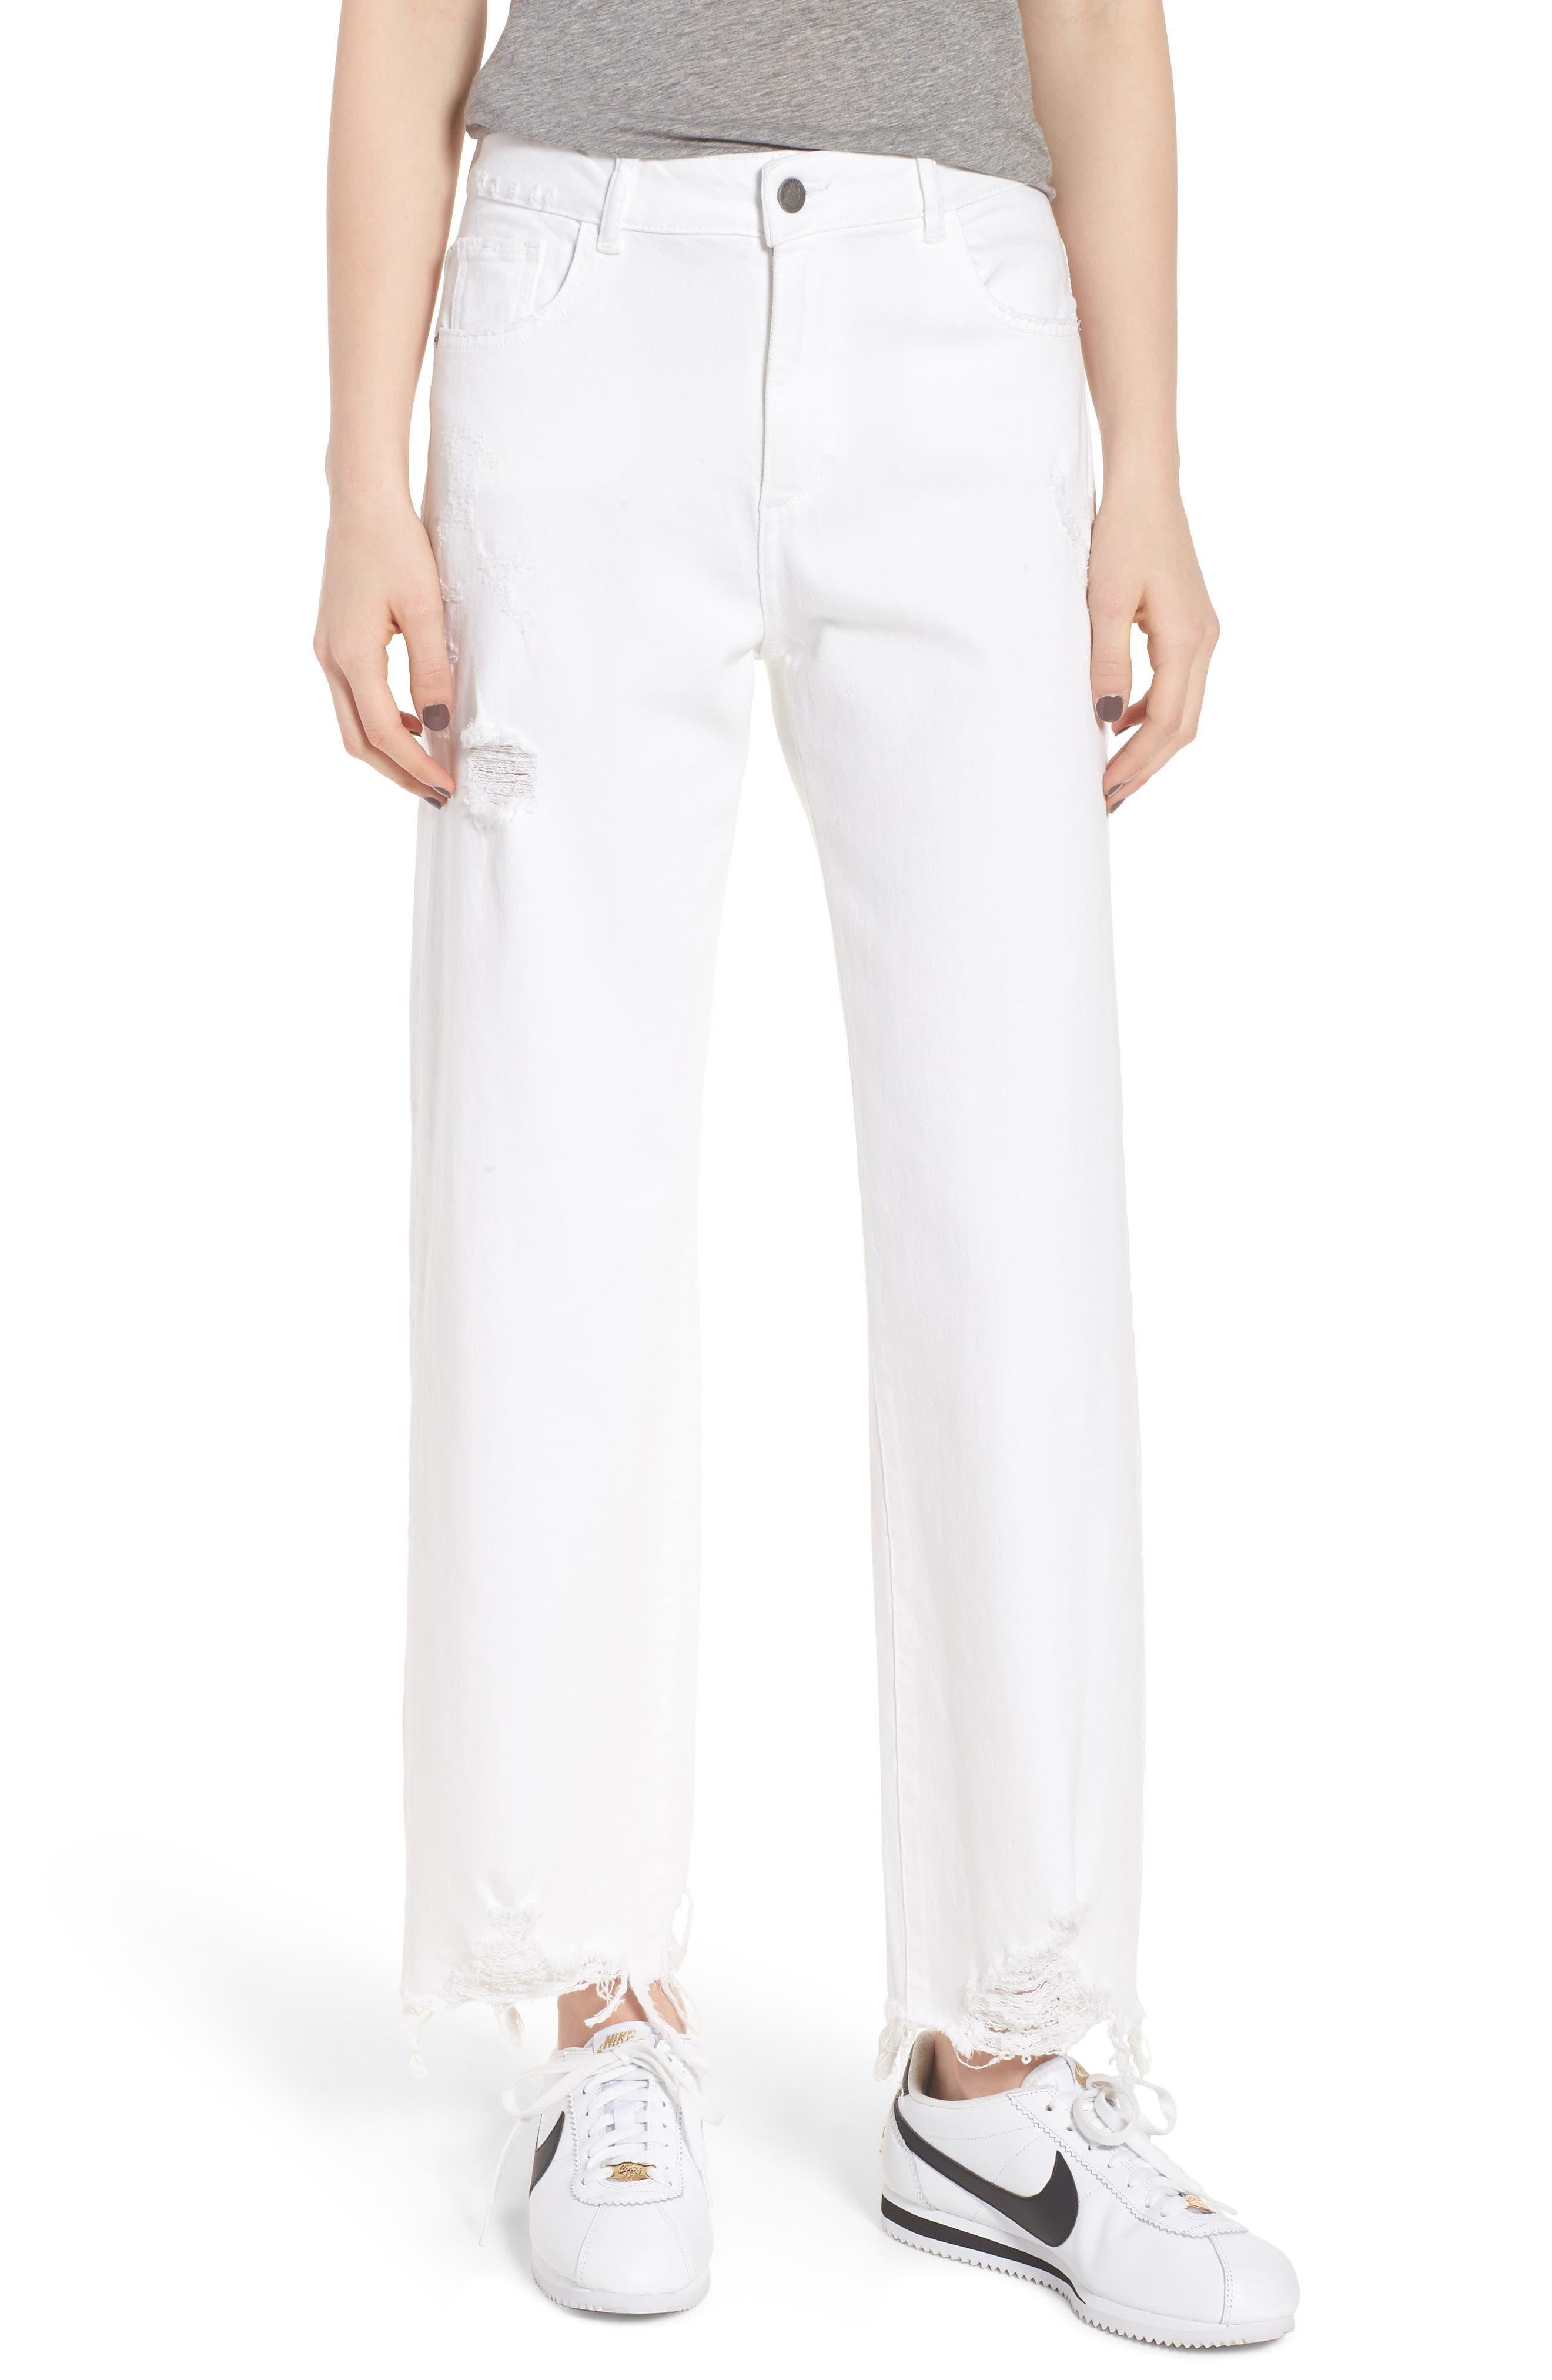 Hepburn High Waist Wide Leg Jeans,                         Main,                         color, Sacramento